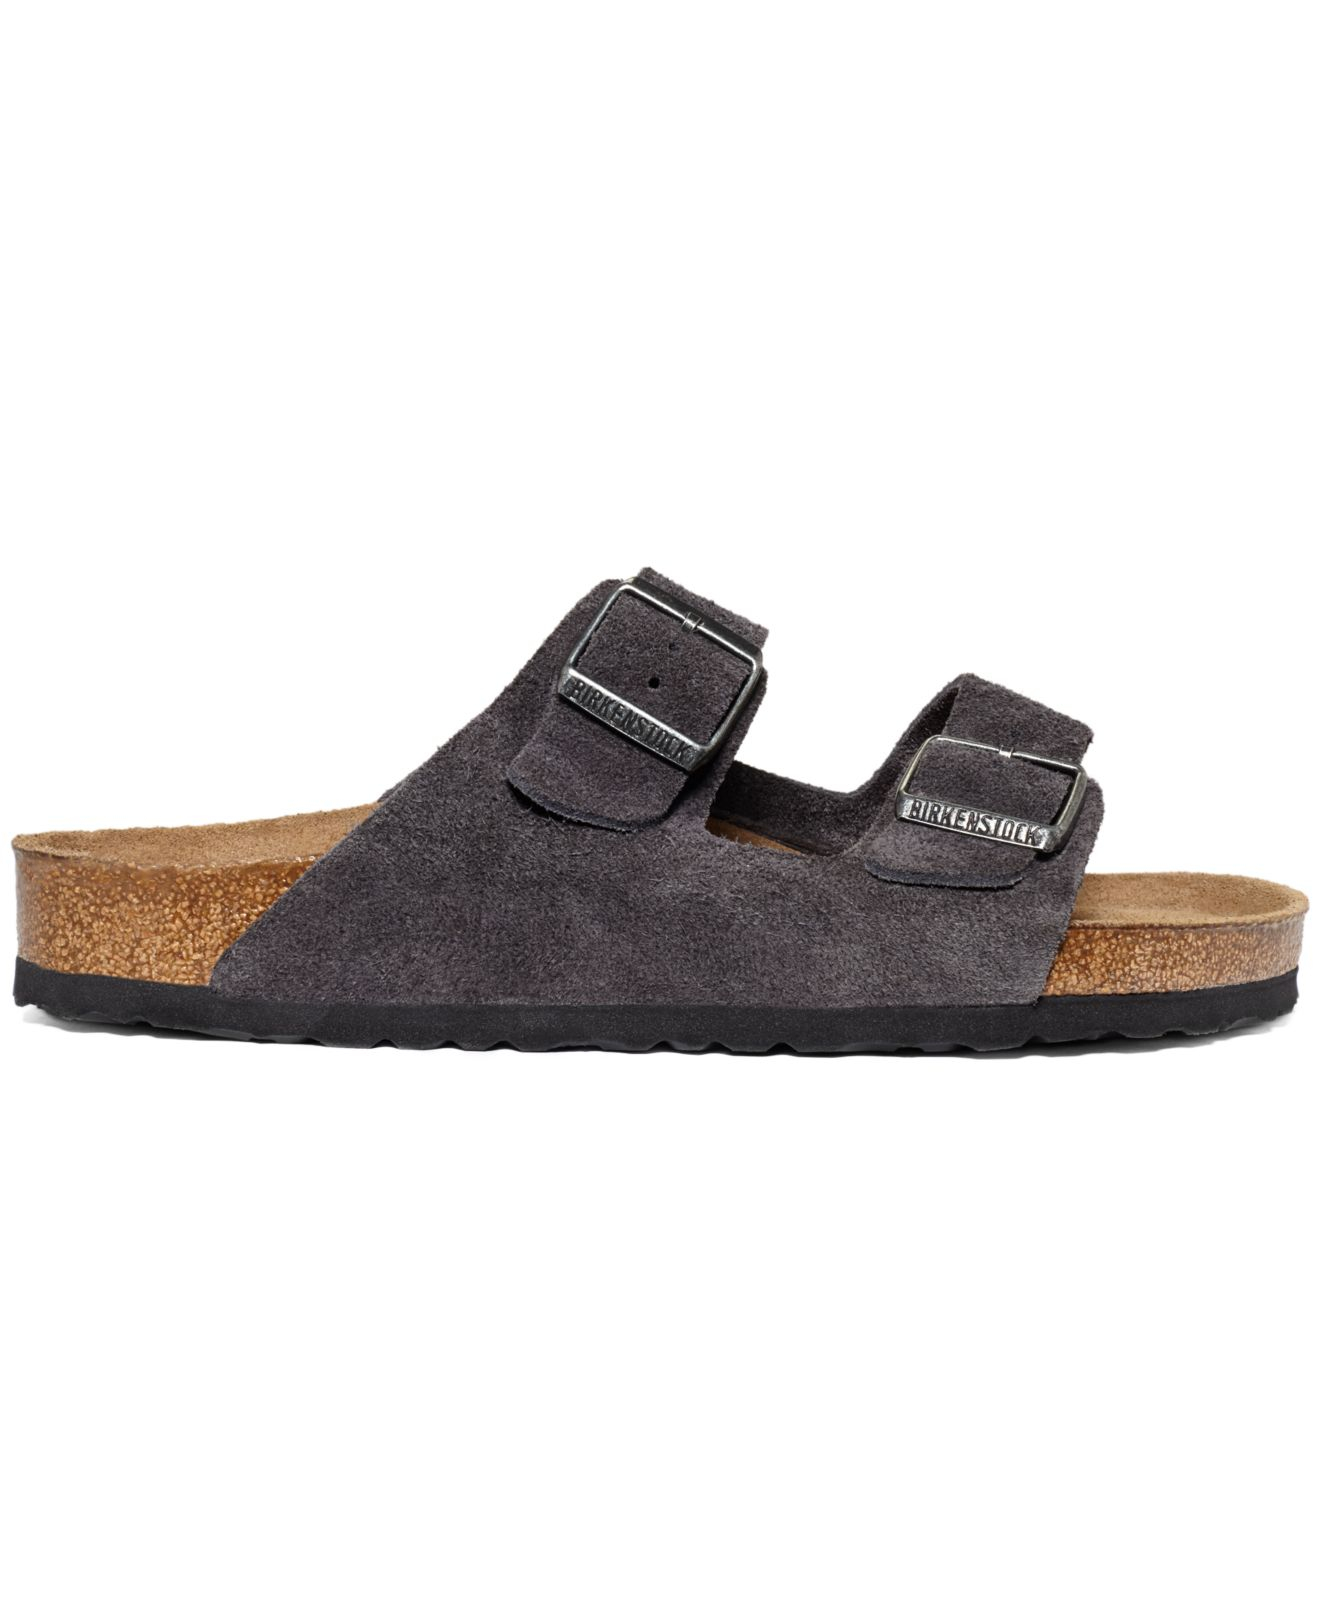 Lyst Birkenstock Arizona Velvet Suede Soft Footbed